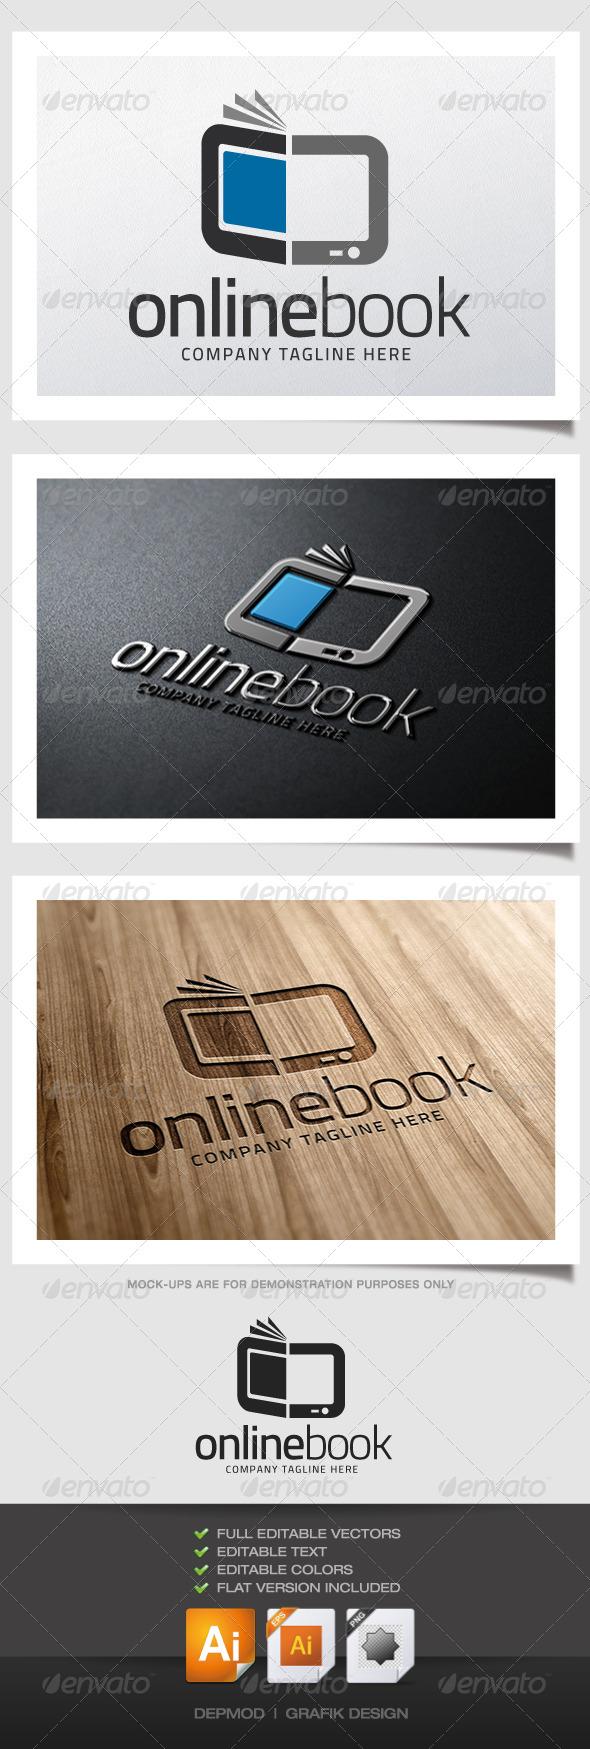 GraphicRiver Online Book Logo 5116203